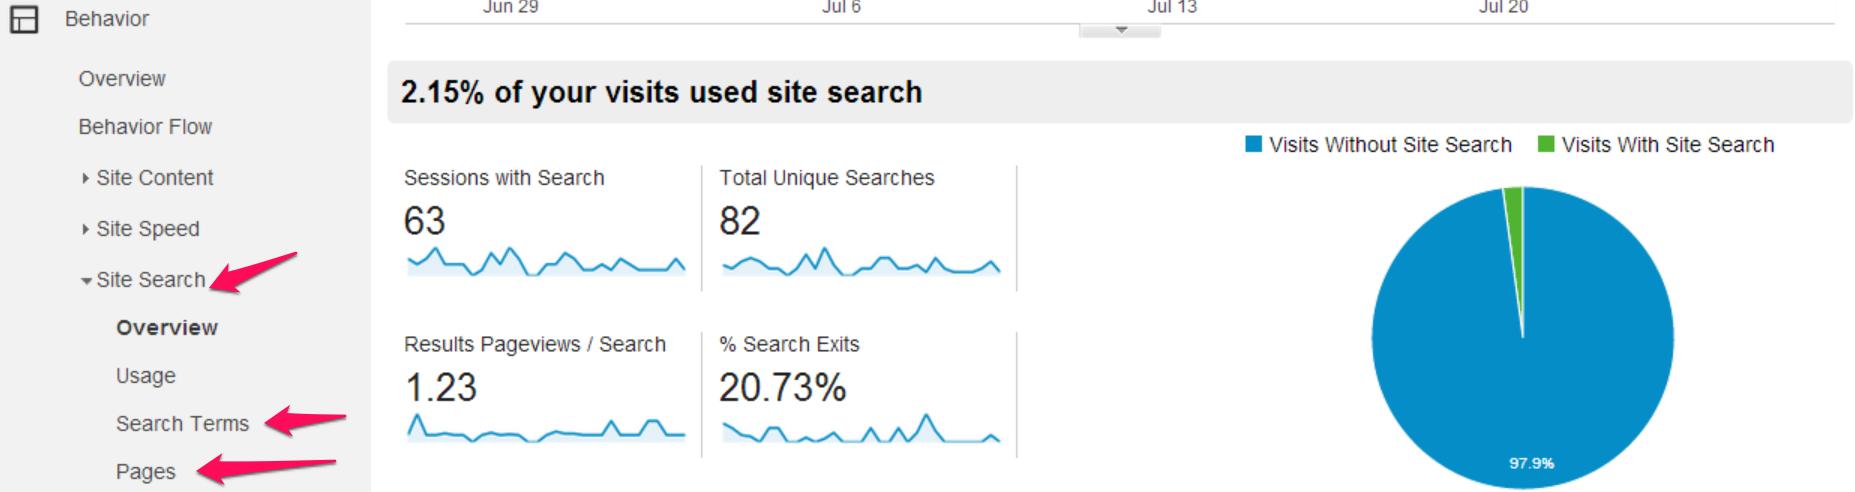 site search reports